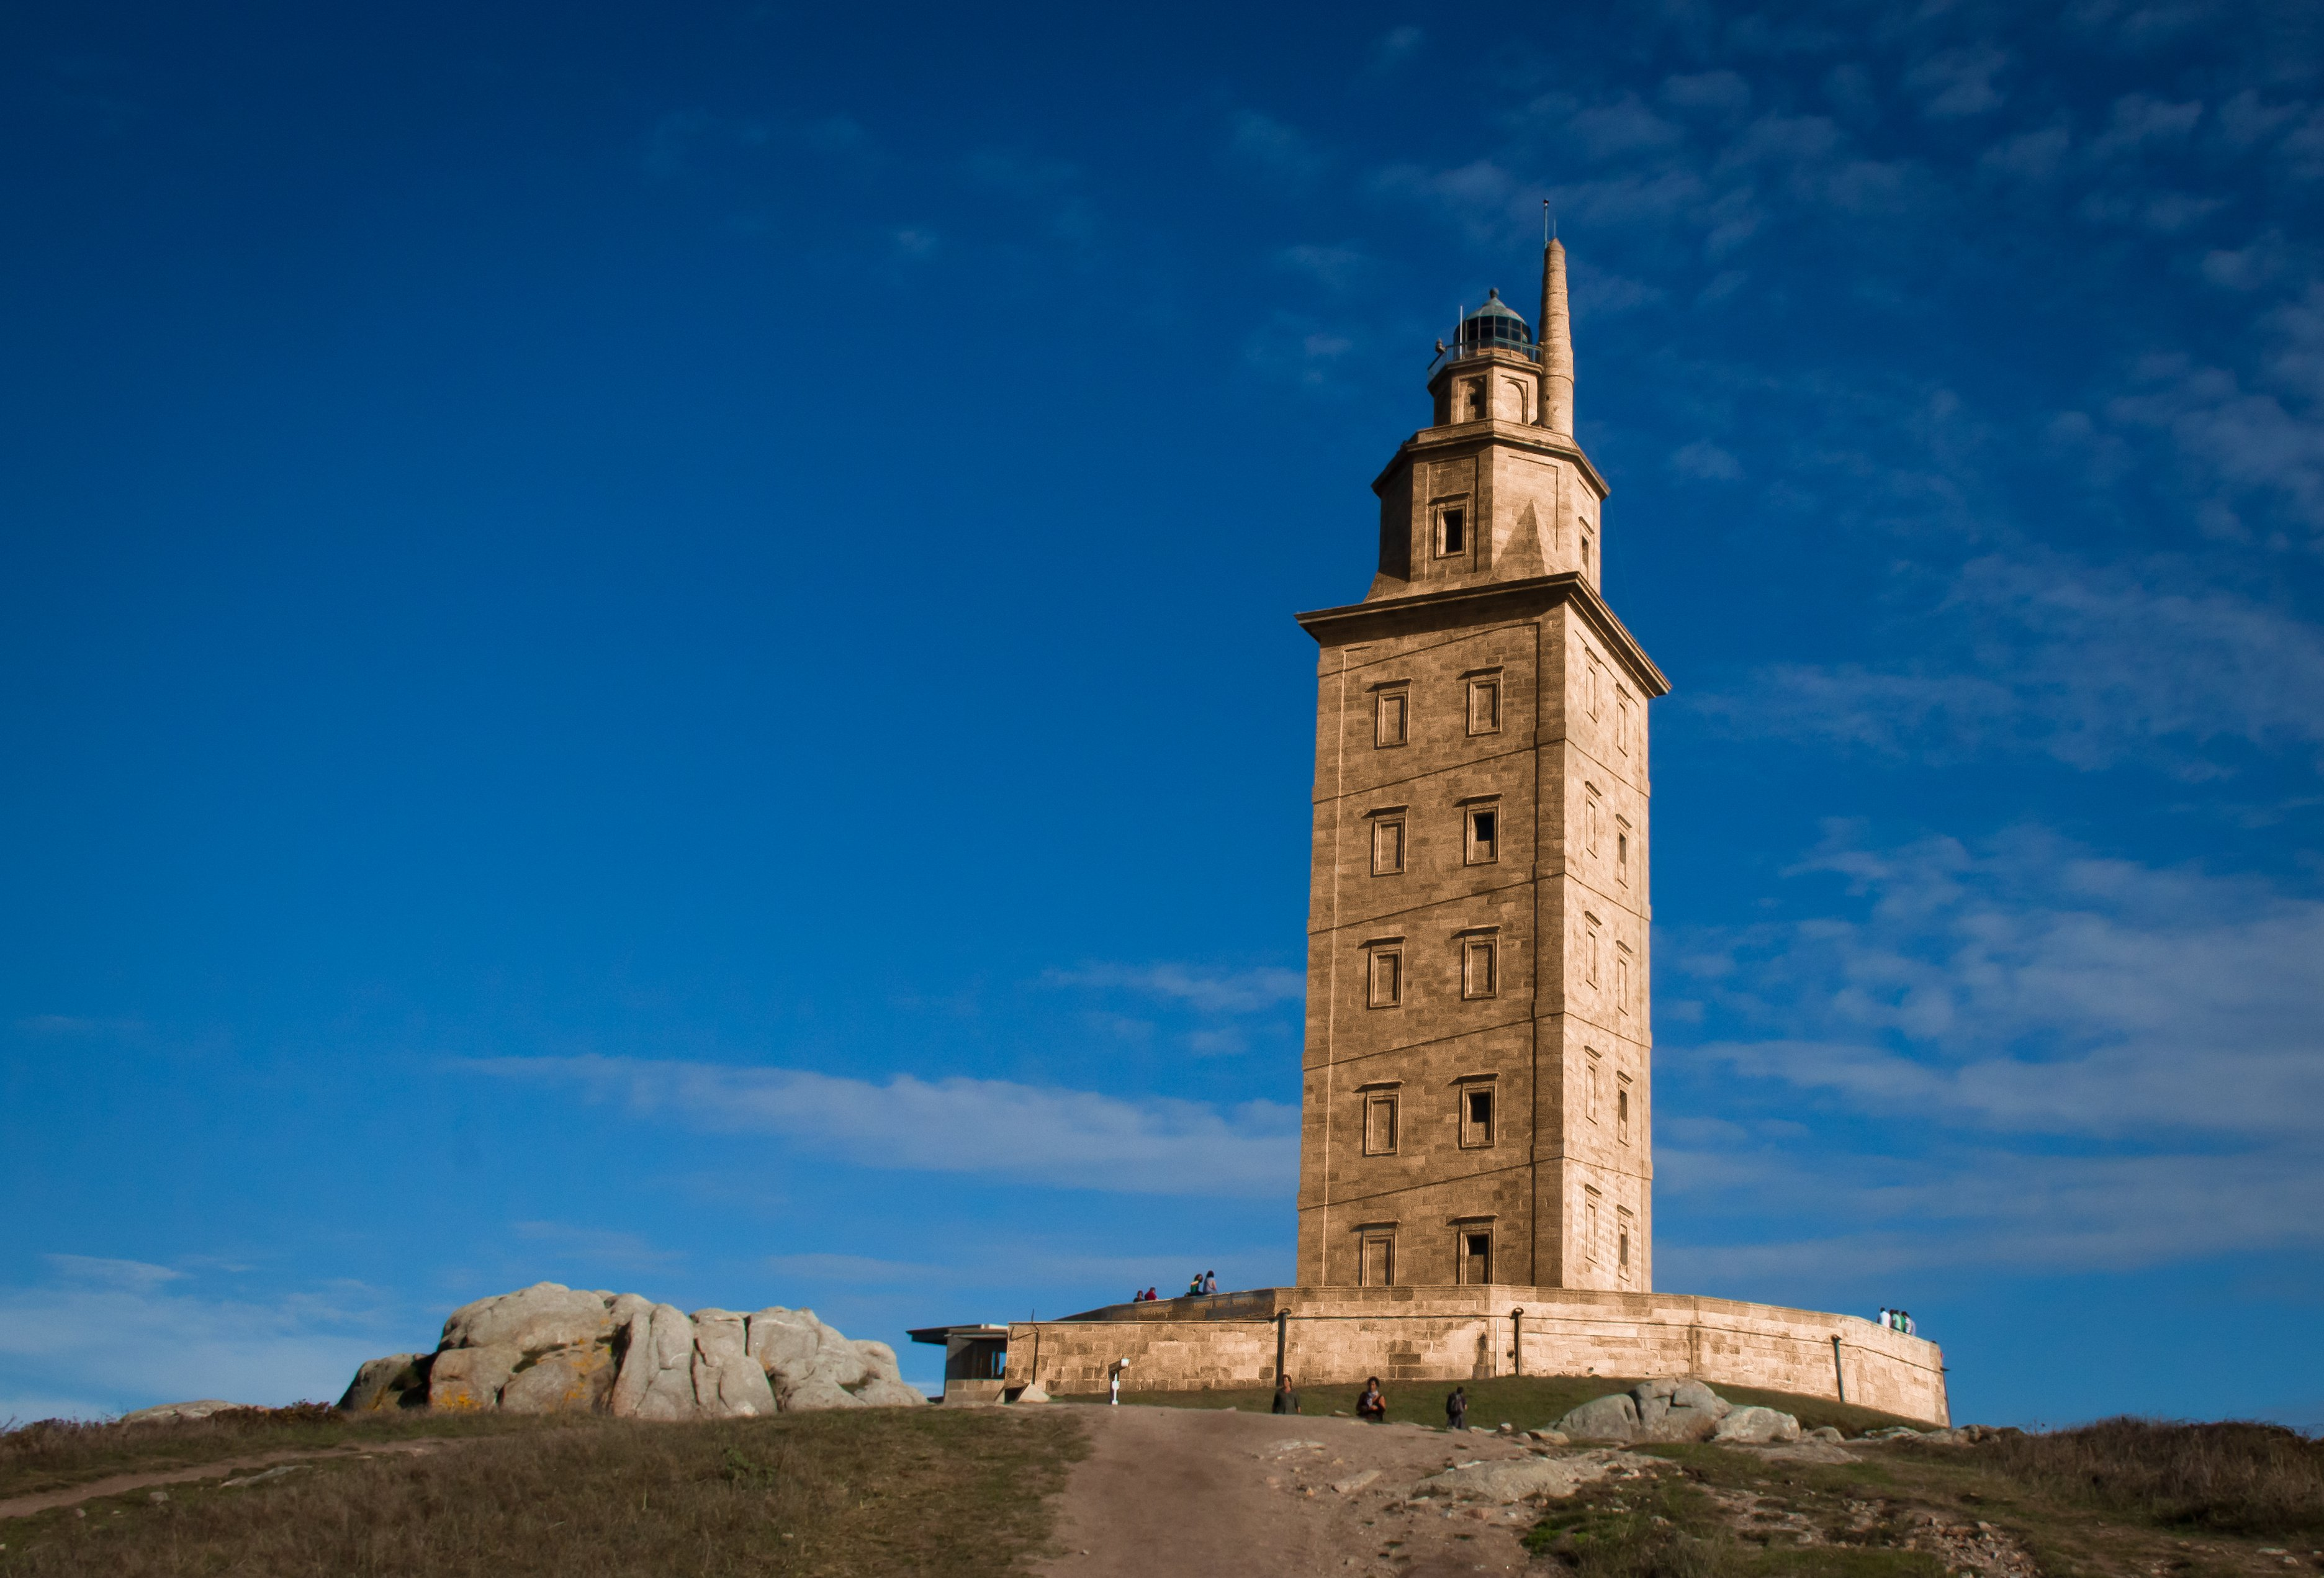 torre de hercules a coruña rutas rias altas